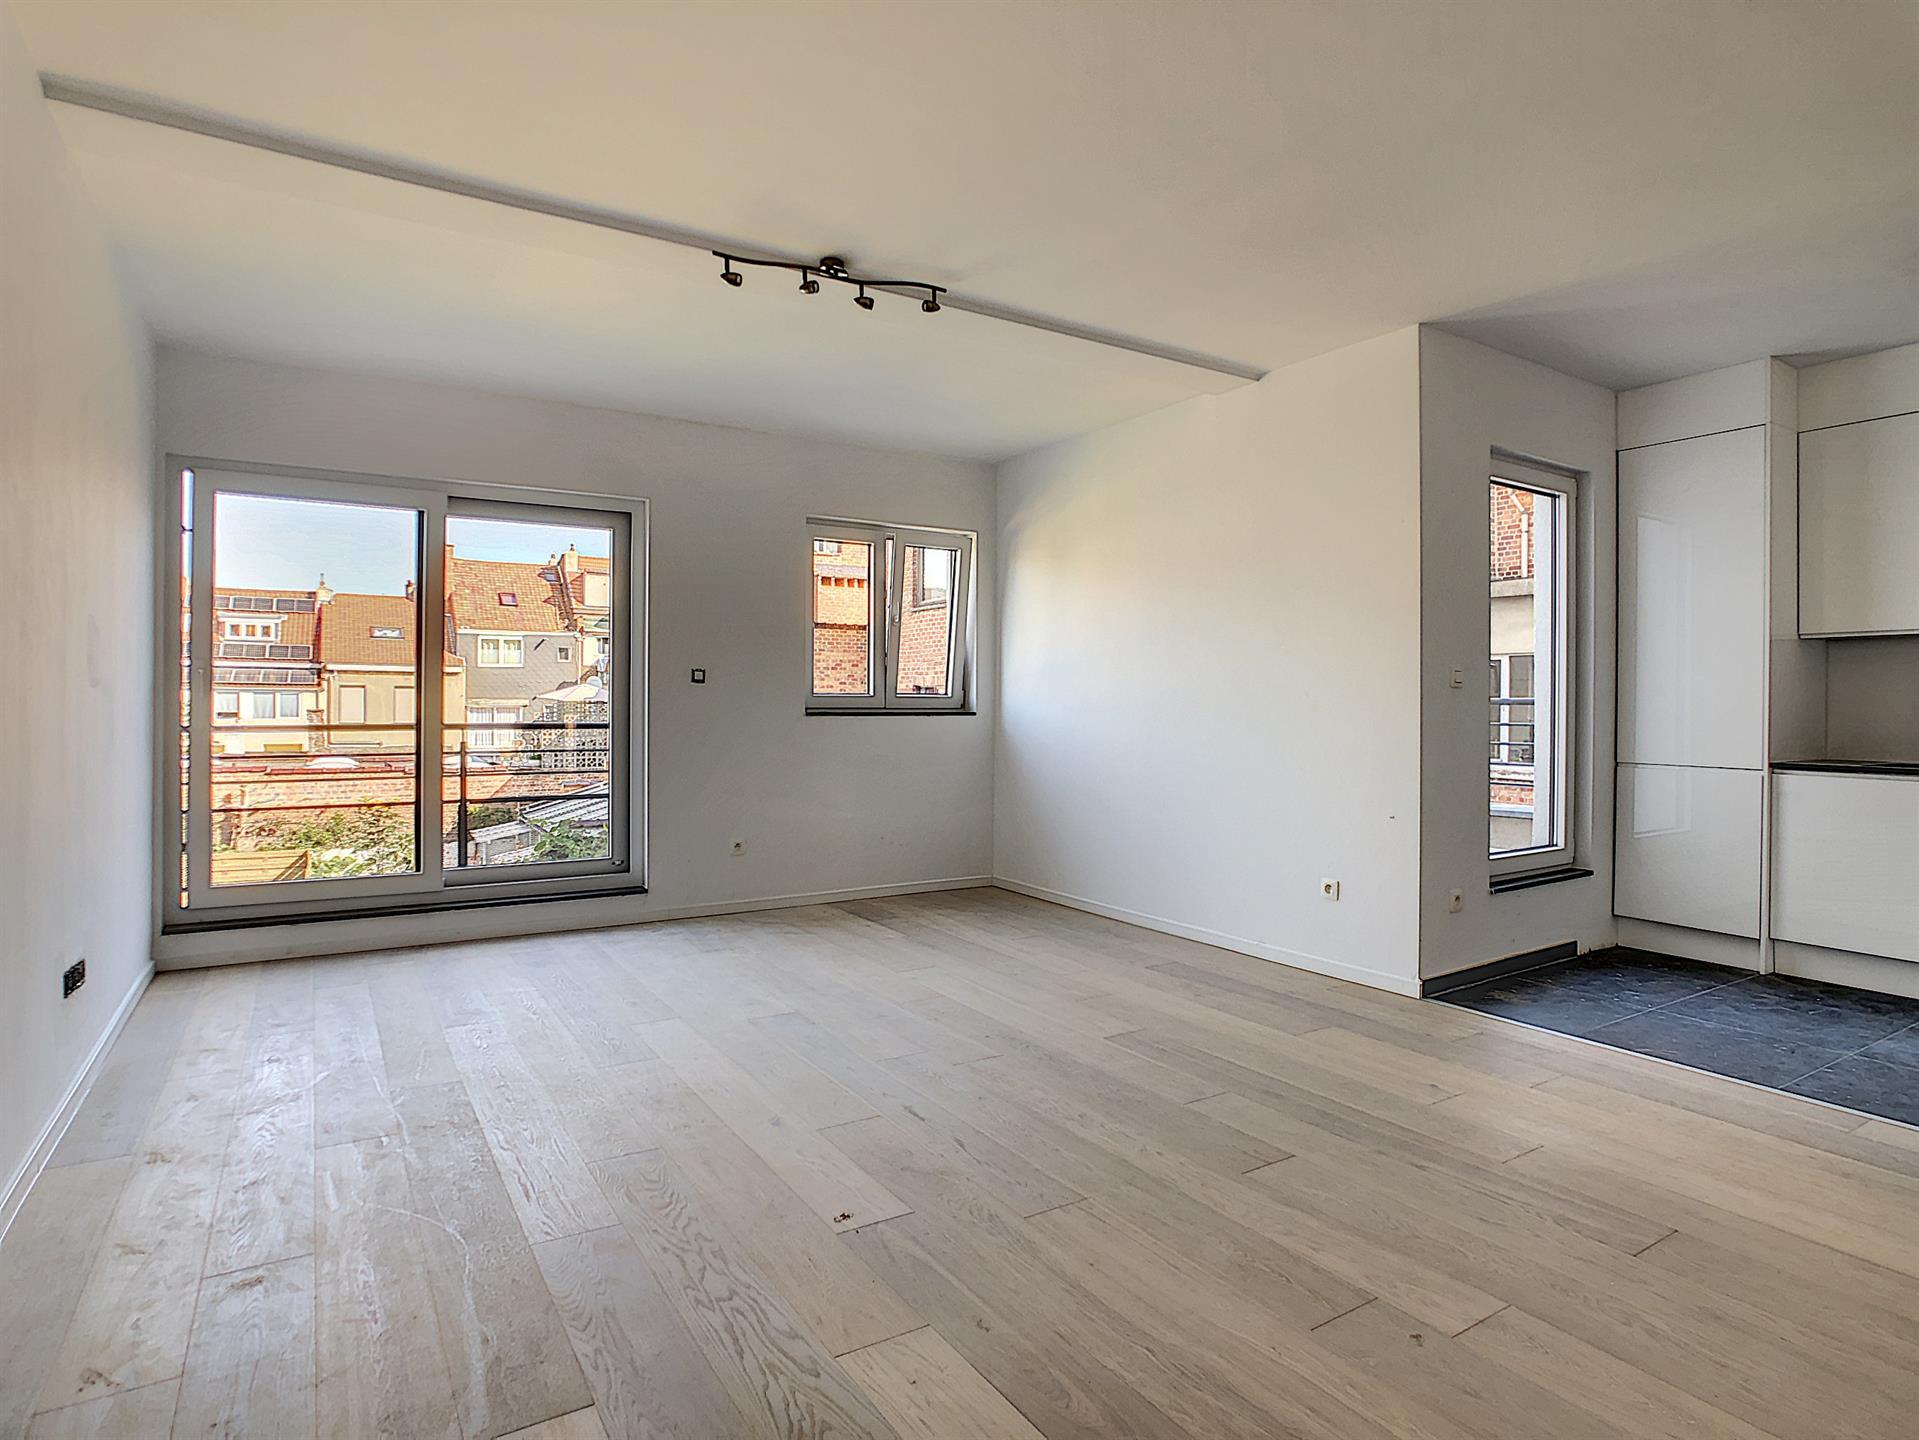 Appartement - Anderlecht - #4252388-4